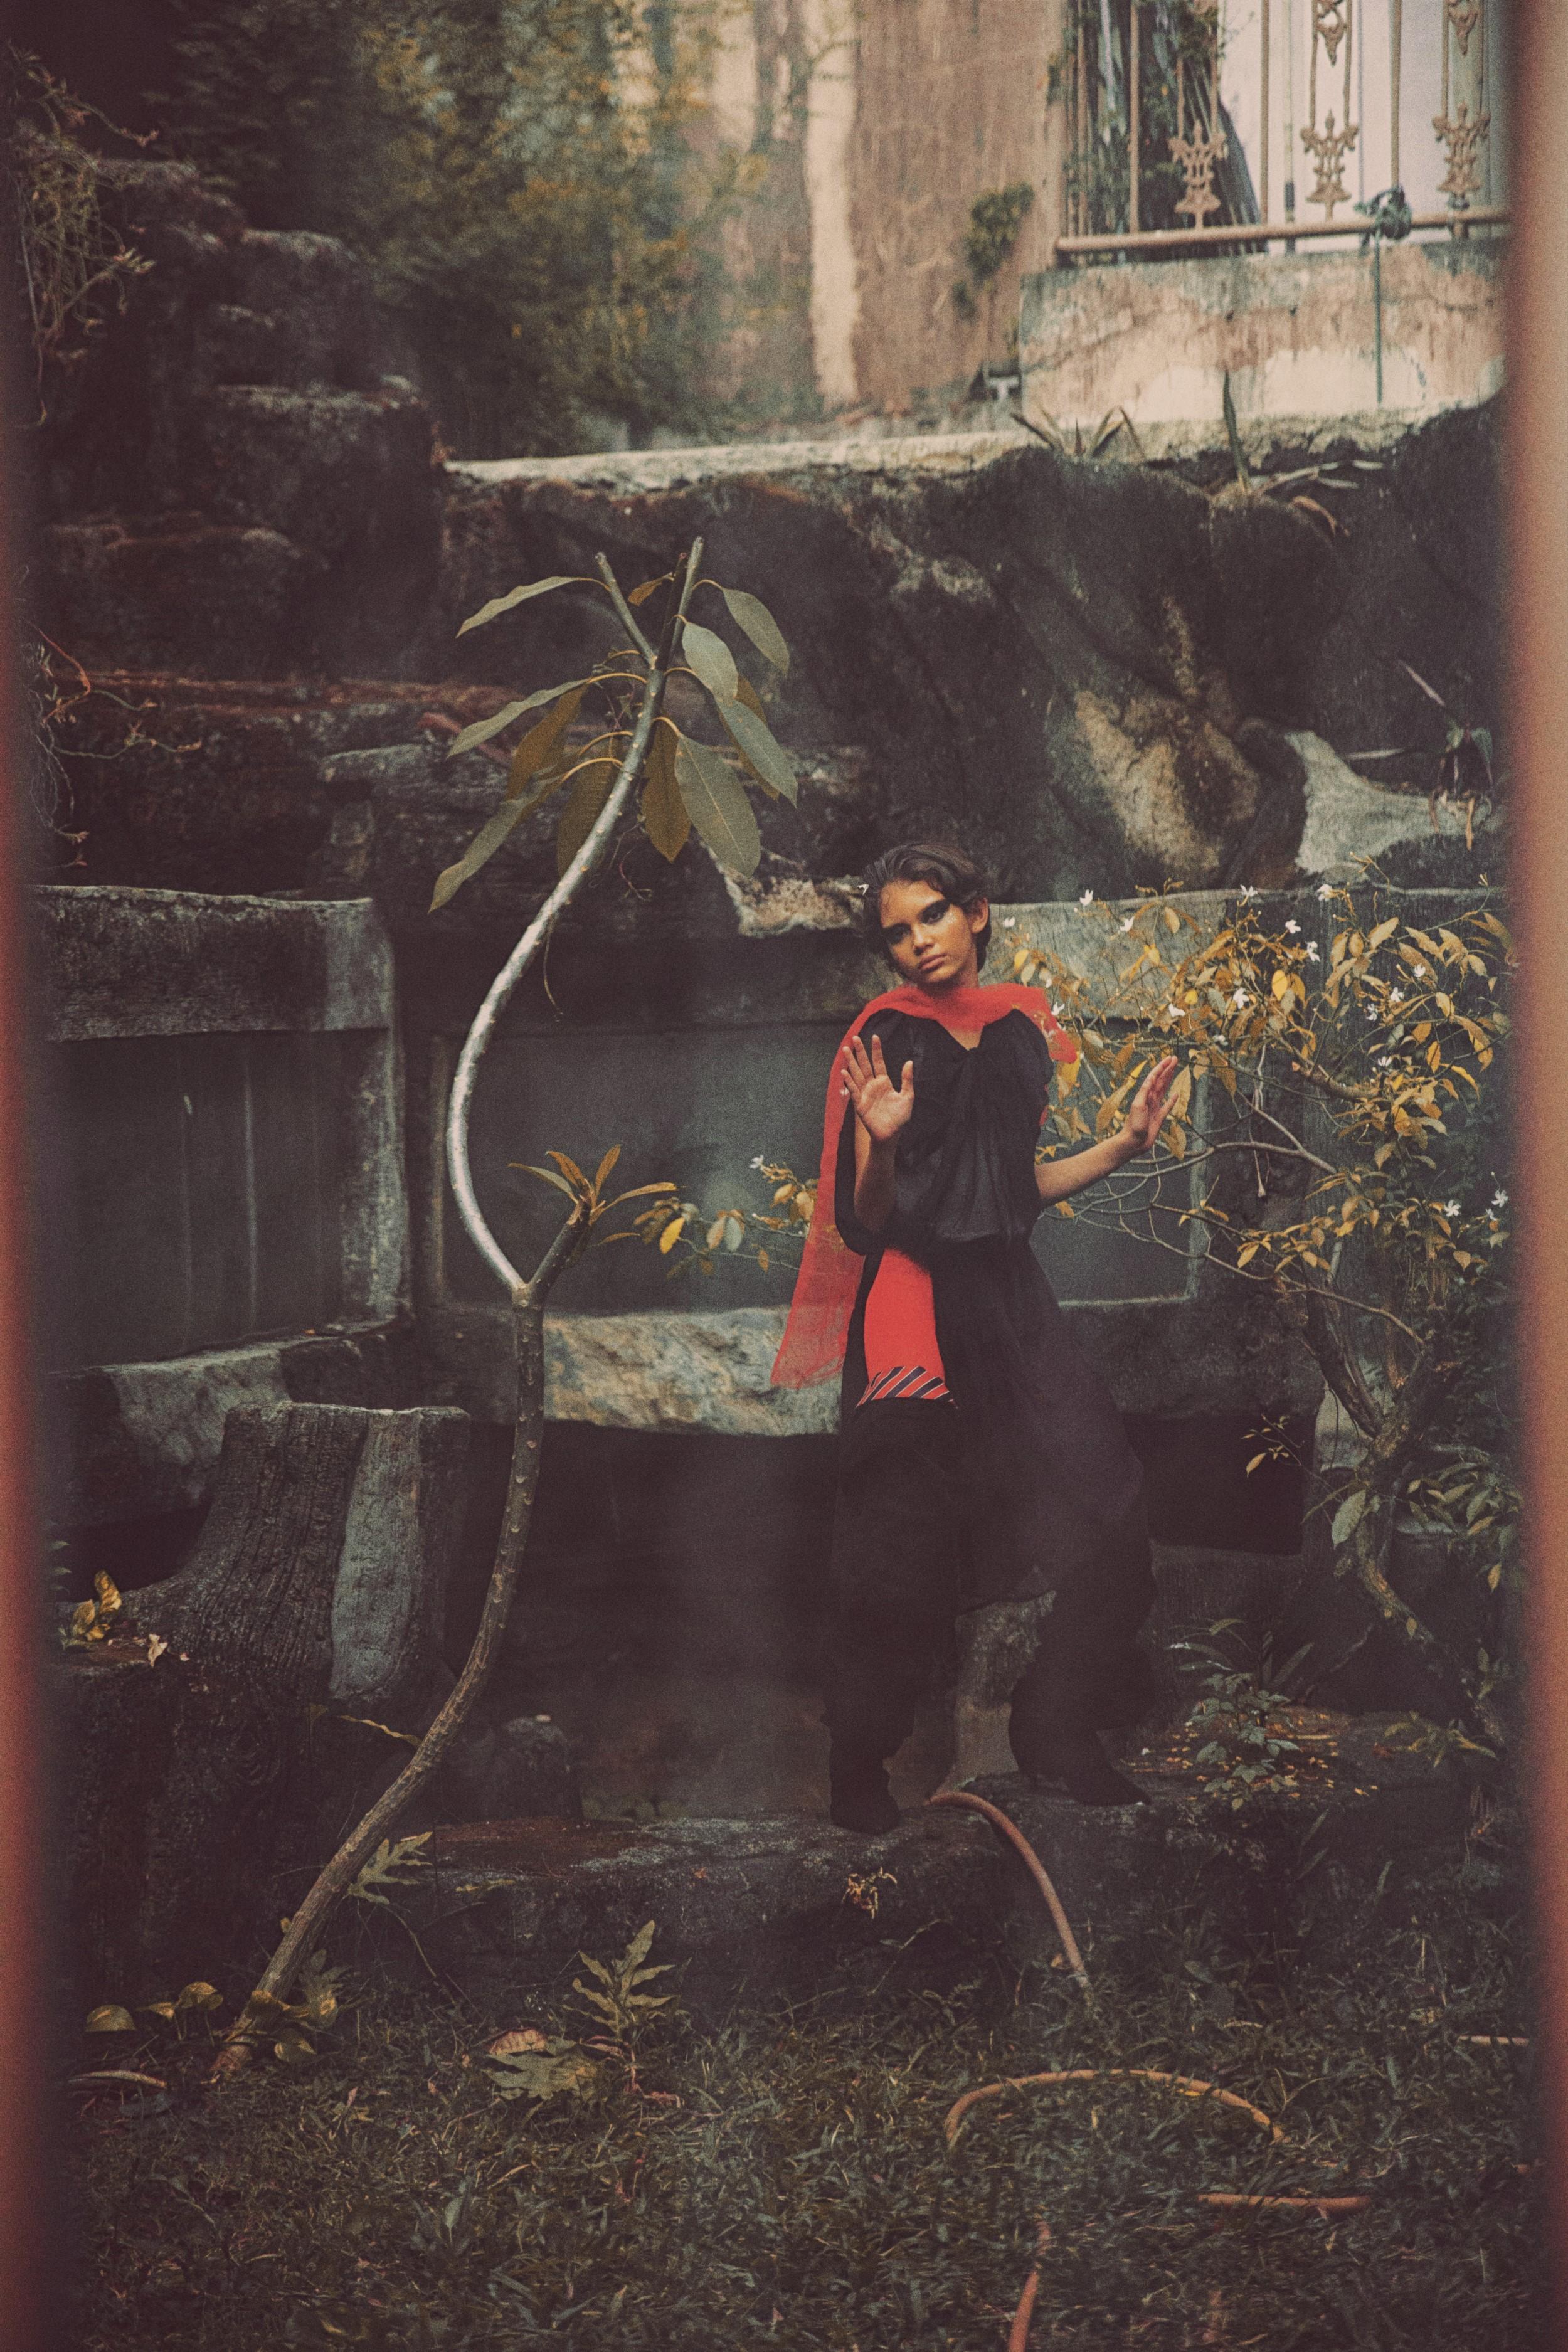 Indonesian Photographer Bintang Adamas 'Shakira' Series for Through the Photographer's Lens, Globetroter Magazine (01).jpg